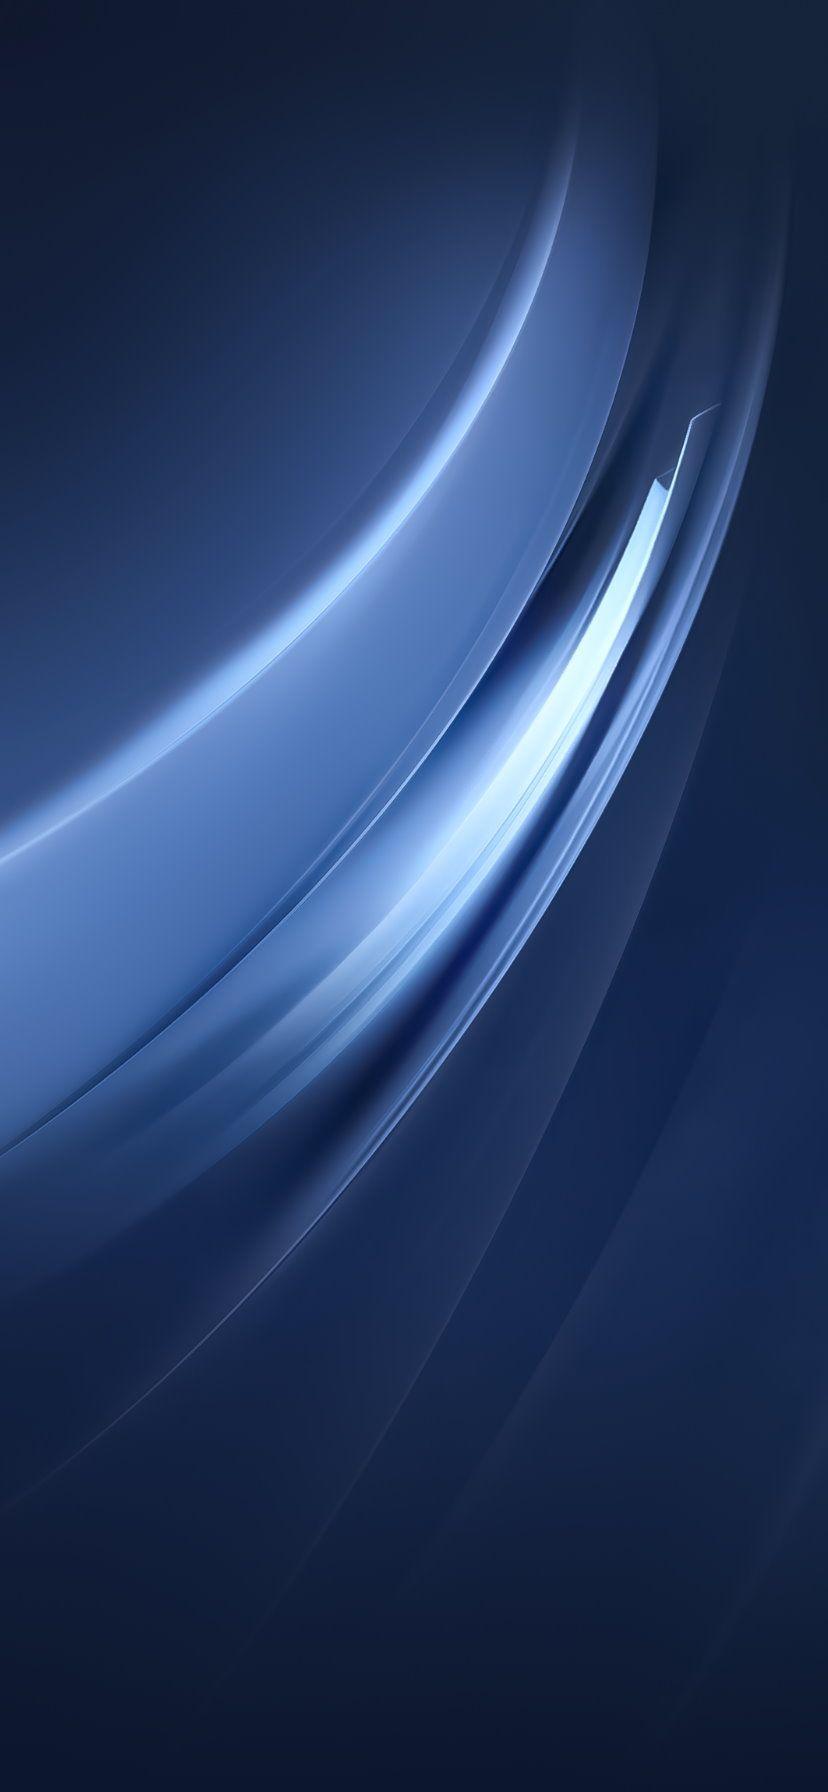 Fond D'ecran Windows 10 : d'ecran, windows, Idées, Fonds, D'écran, Windows, Téléphone,, écran